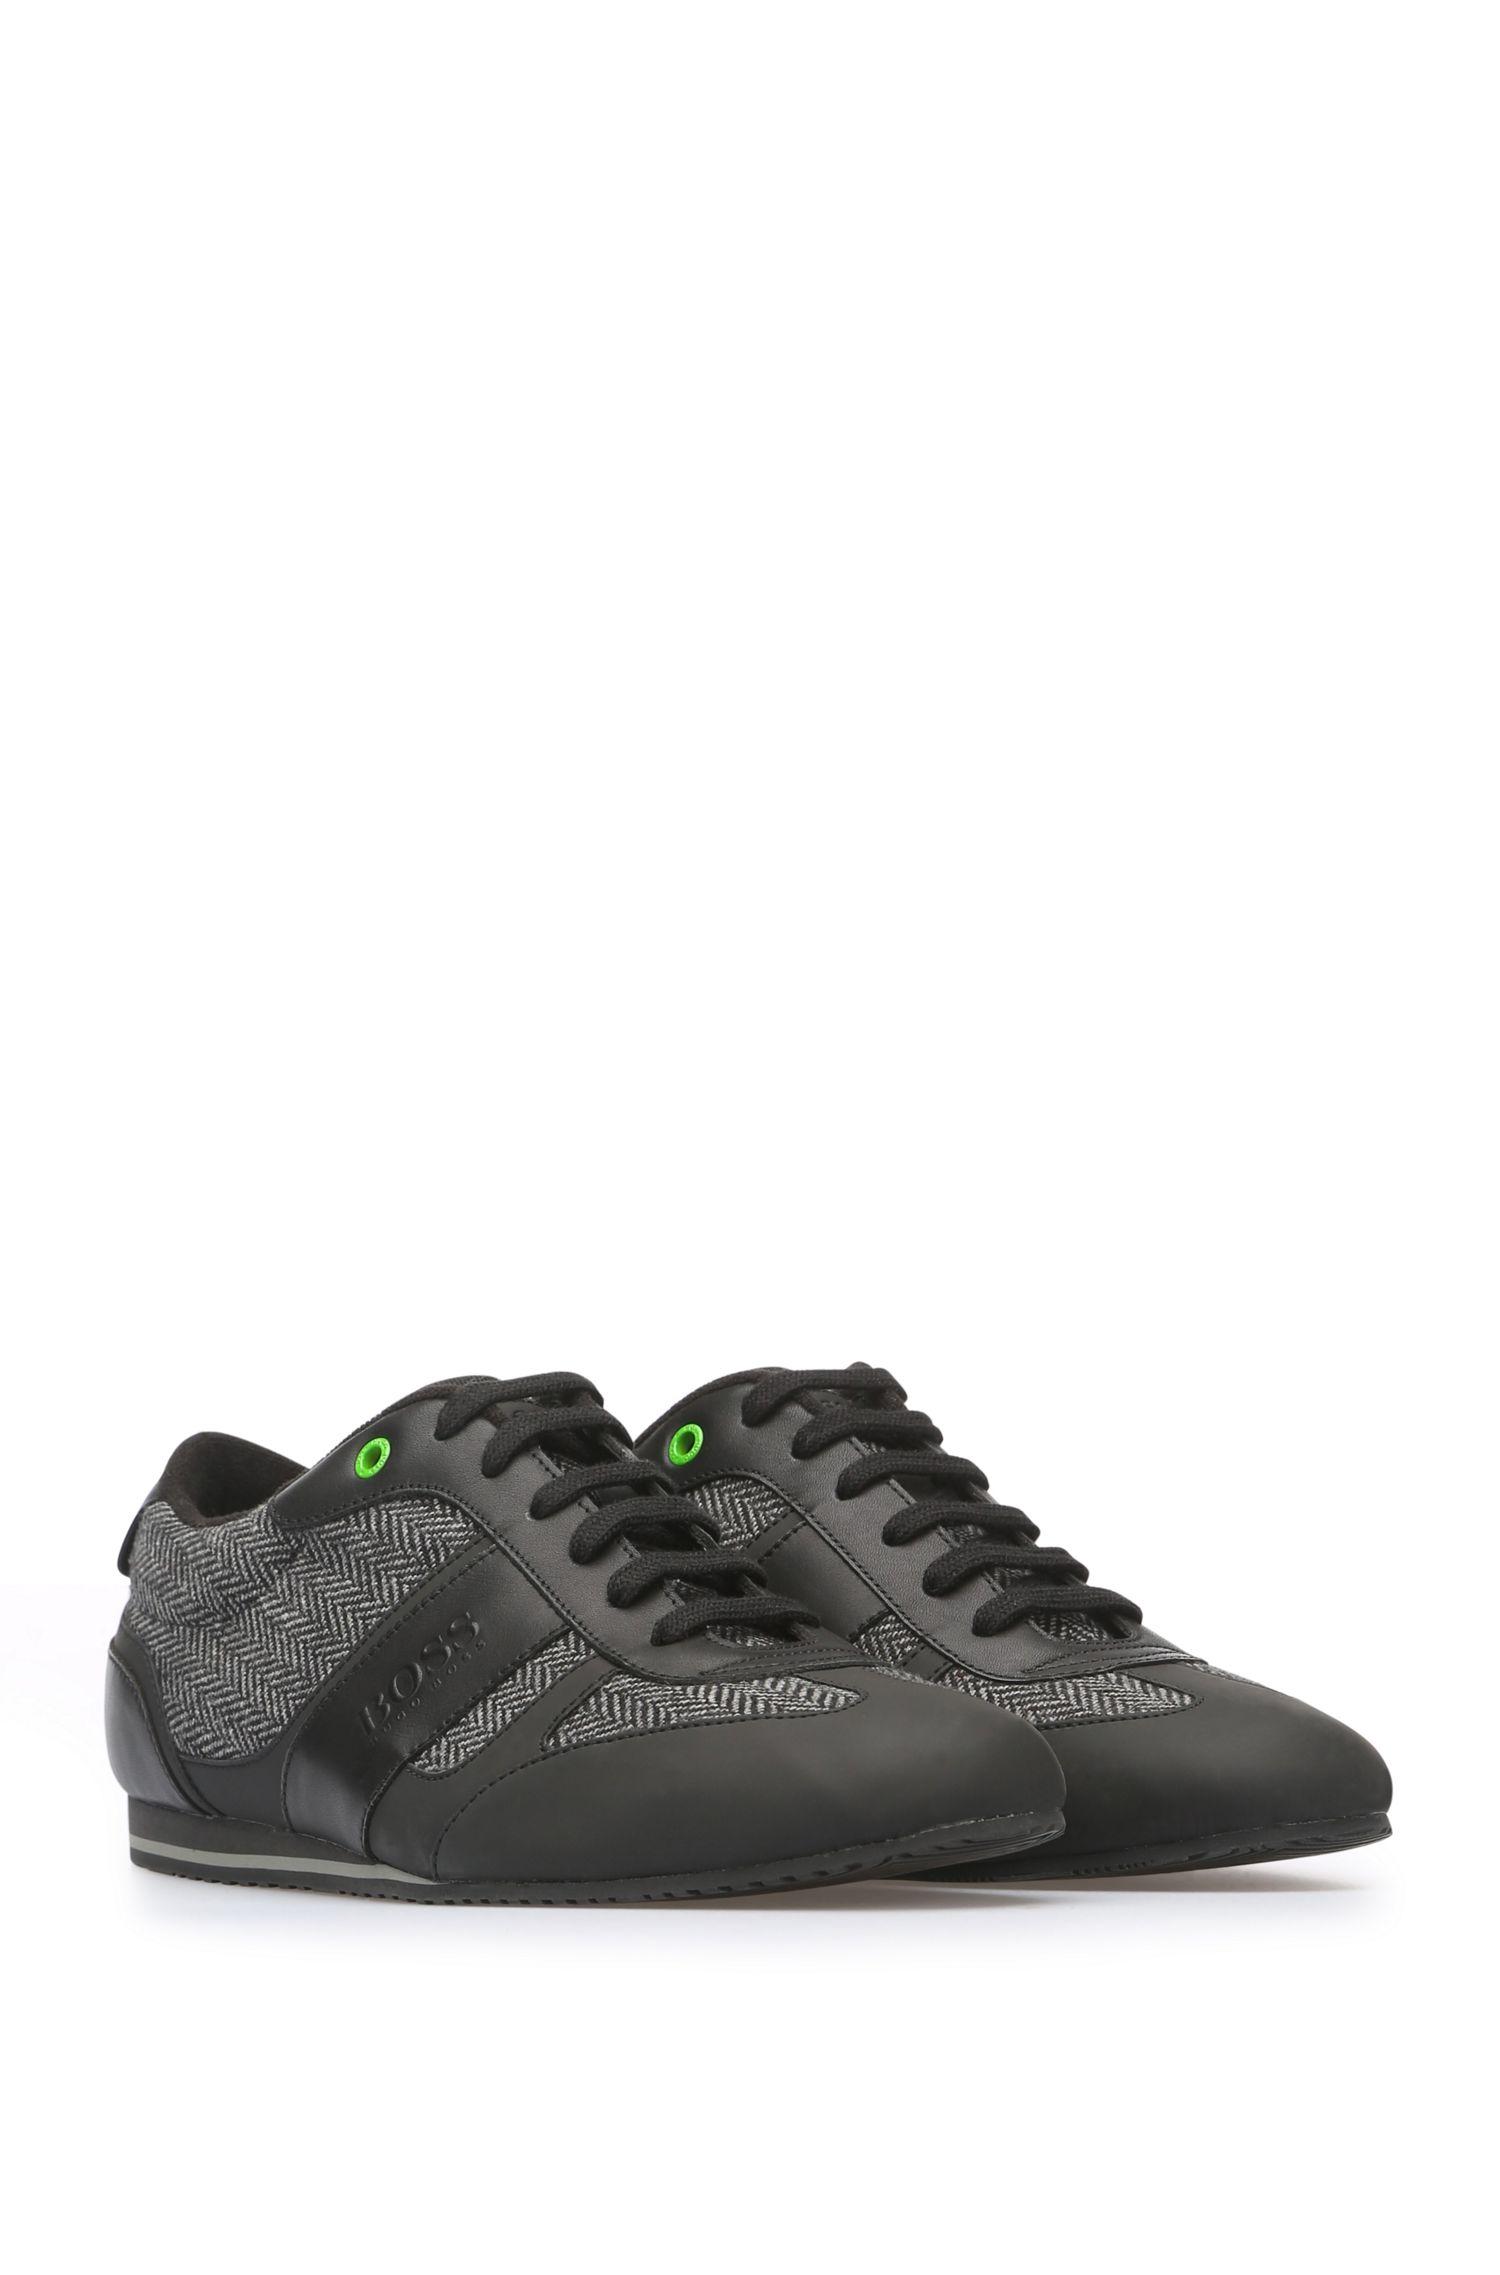 Sneakers aus einem Material-Mix mit Leder und Textil: ´Lighter_Lowp_cohr`